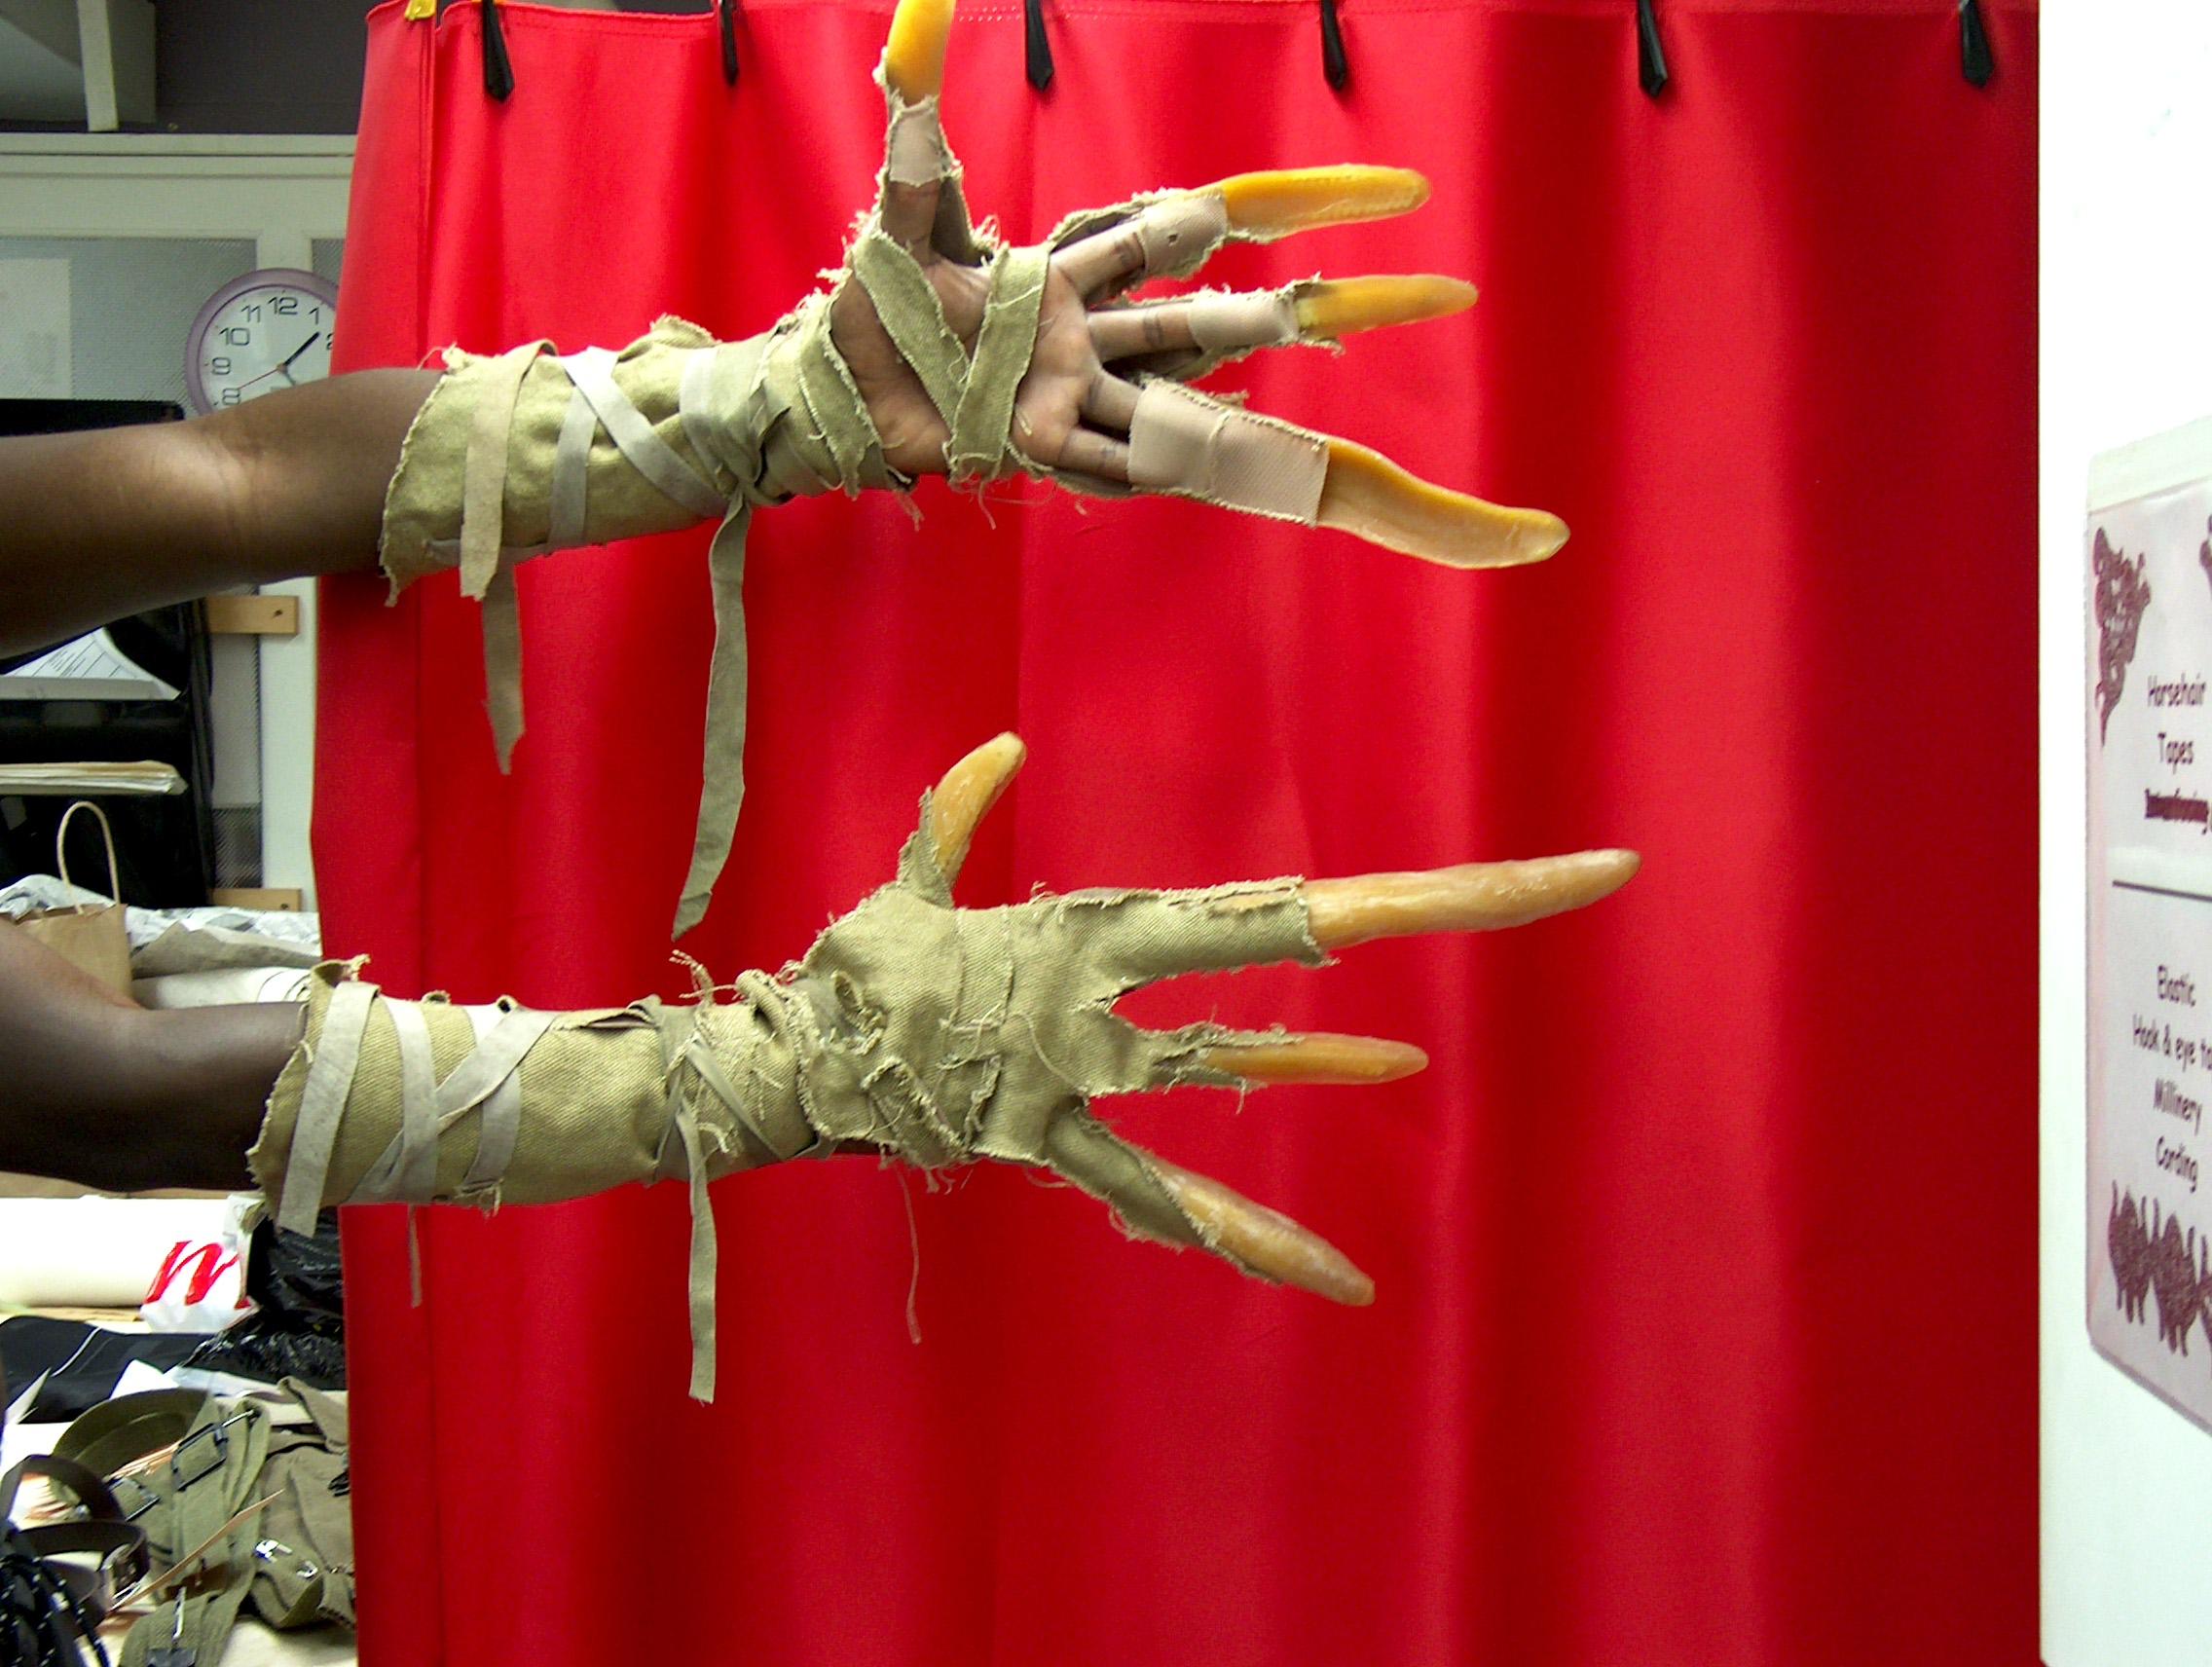 NYC Opera Gloves